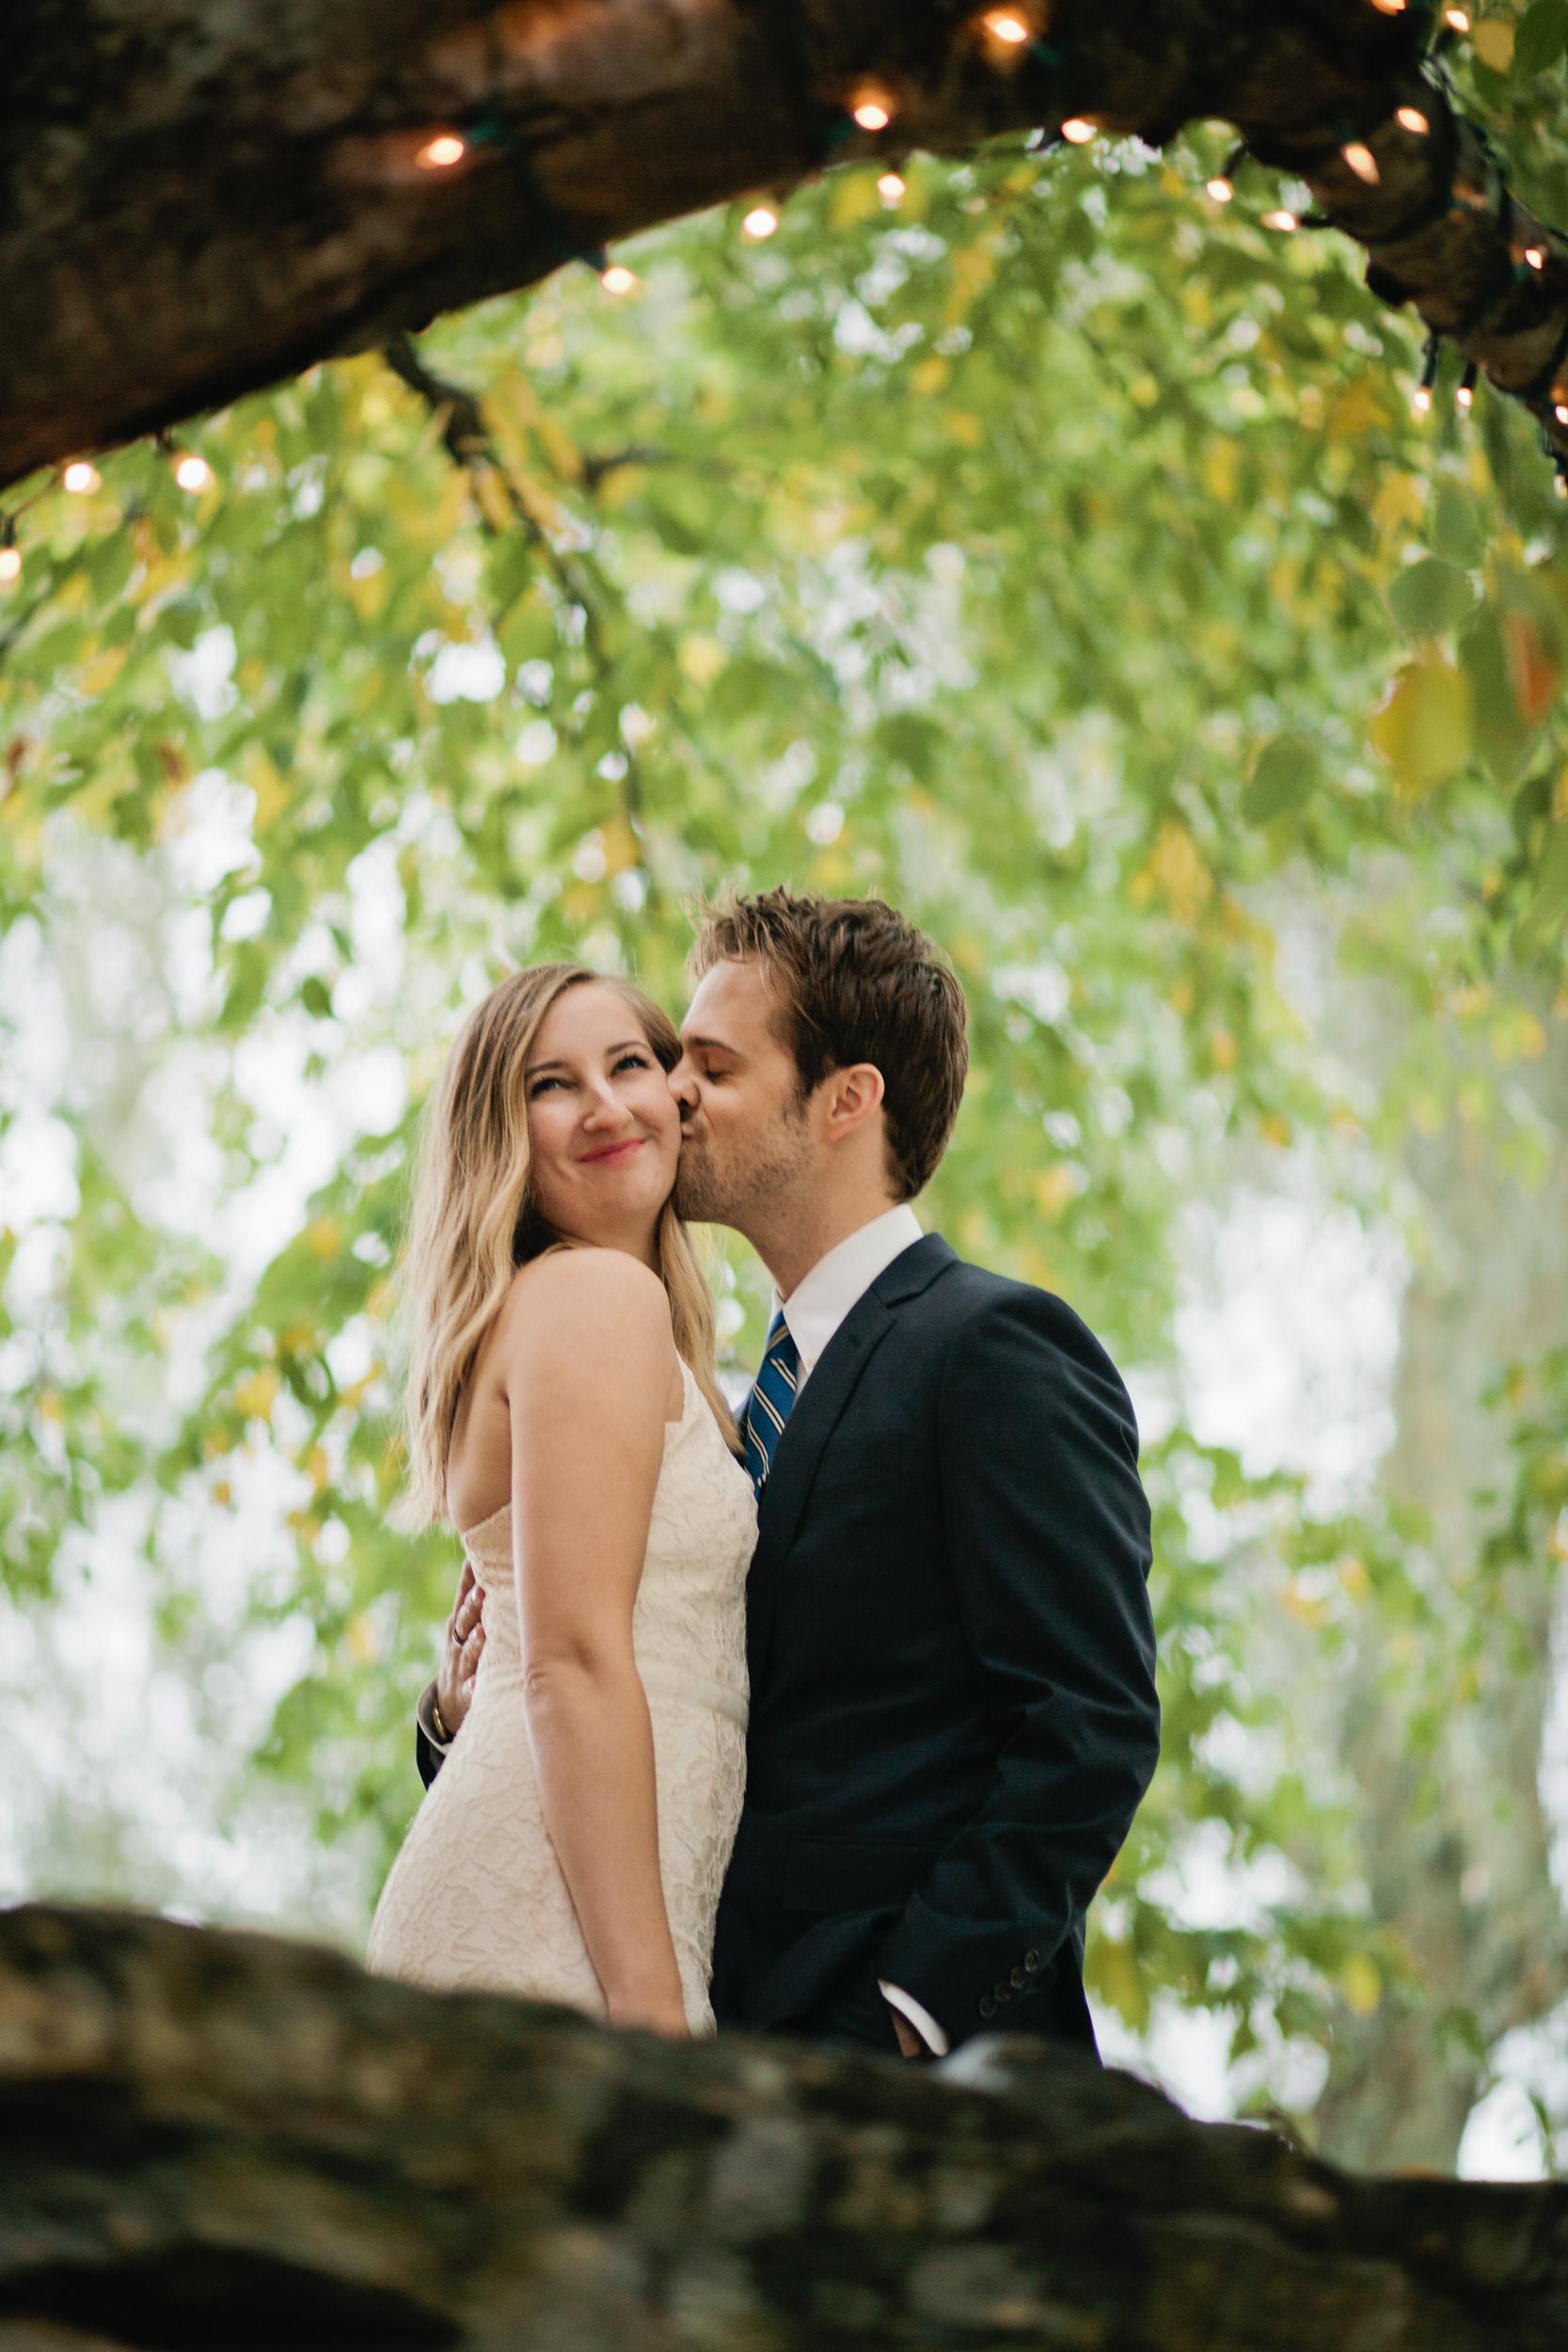 Maine-Wedding-Photographer-1050.jpg